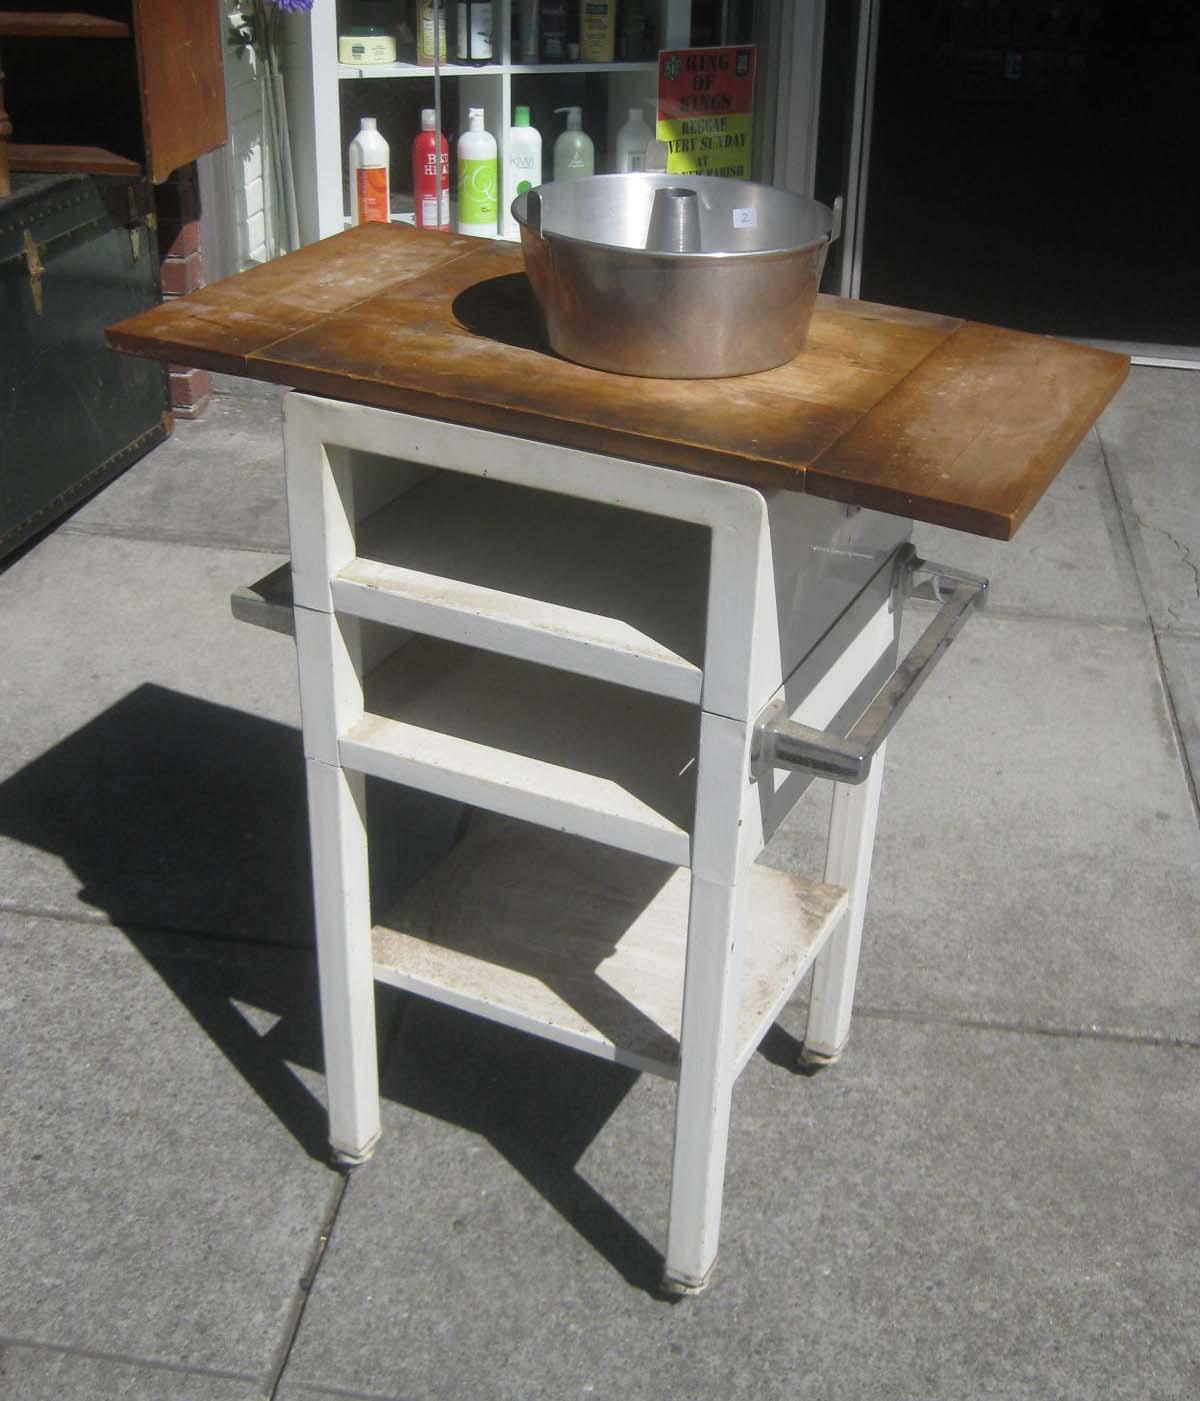 UHURU FURNITURE & COLLECTIBLES SOLD Slender Rolling Kitchen Cart $75